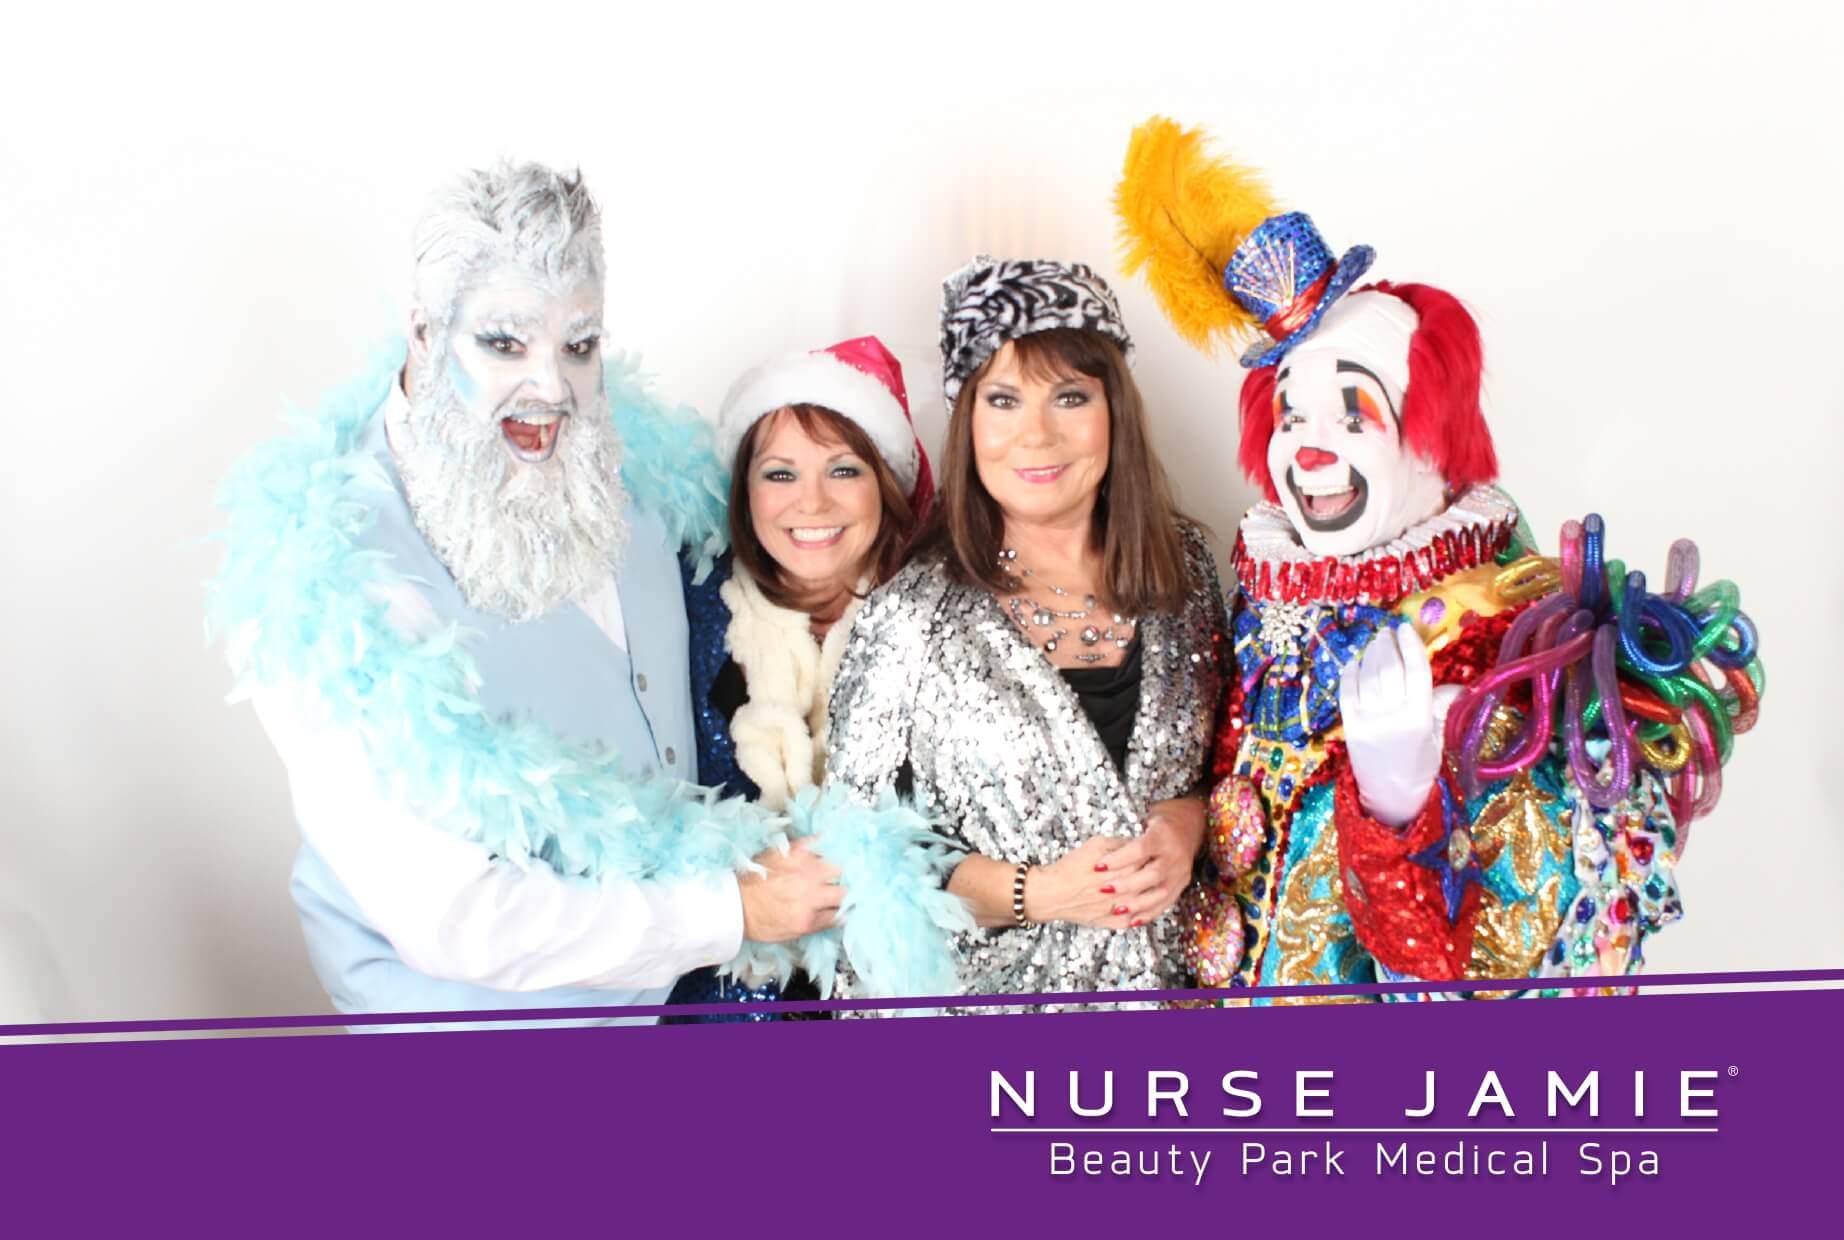 Nurse Jaime Photo Booth